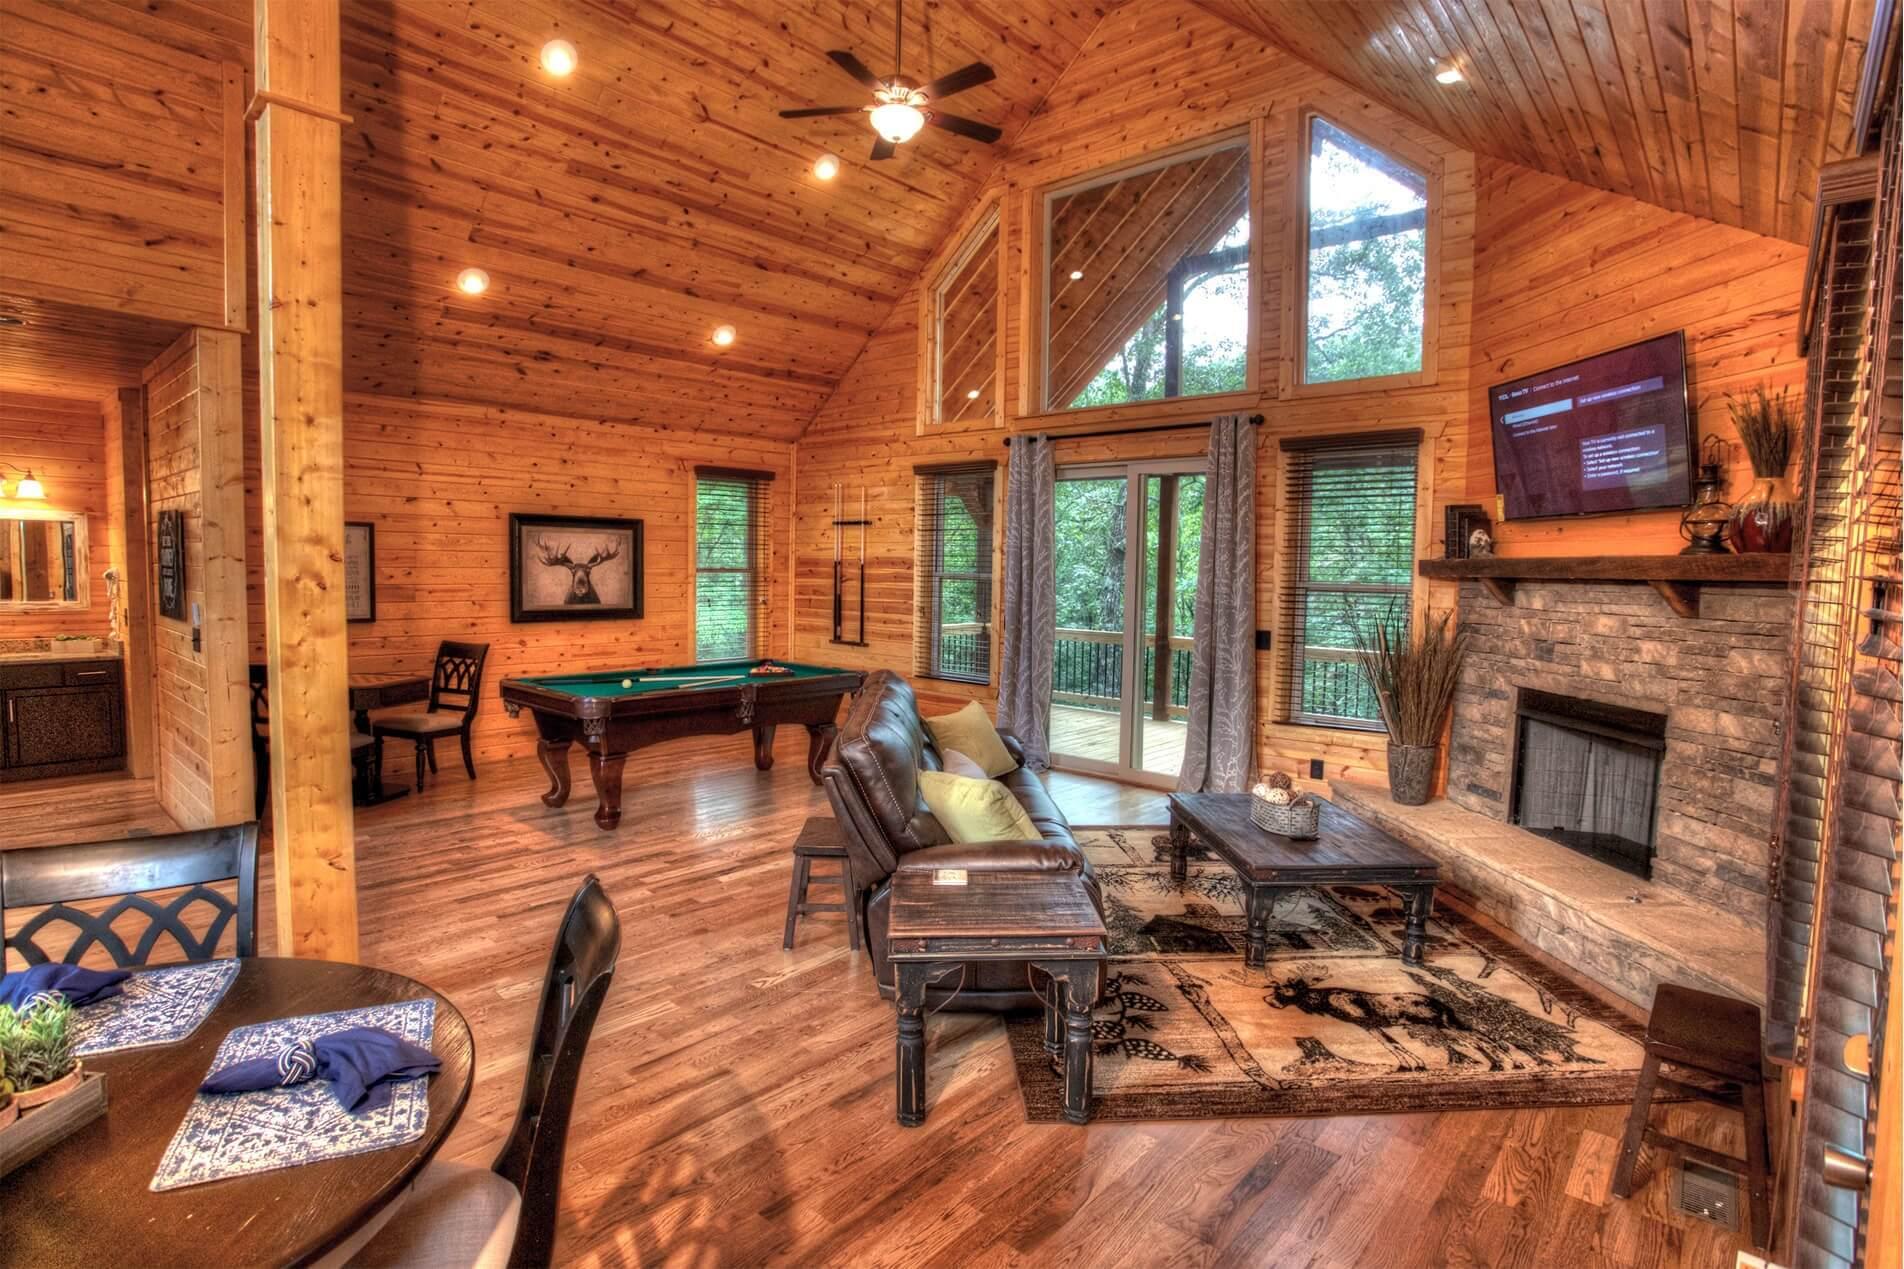 Destiny-Cedar-Creek-Cabin-Rentals-Helen-Georgia-top-banner-tiny